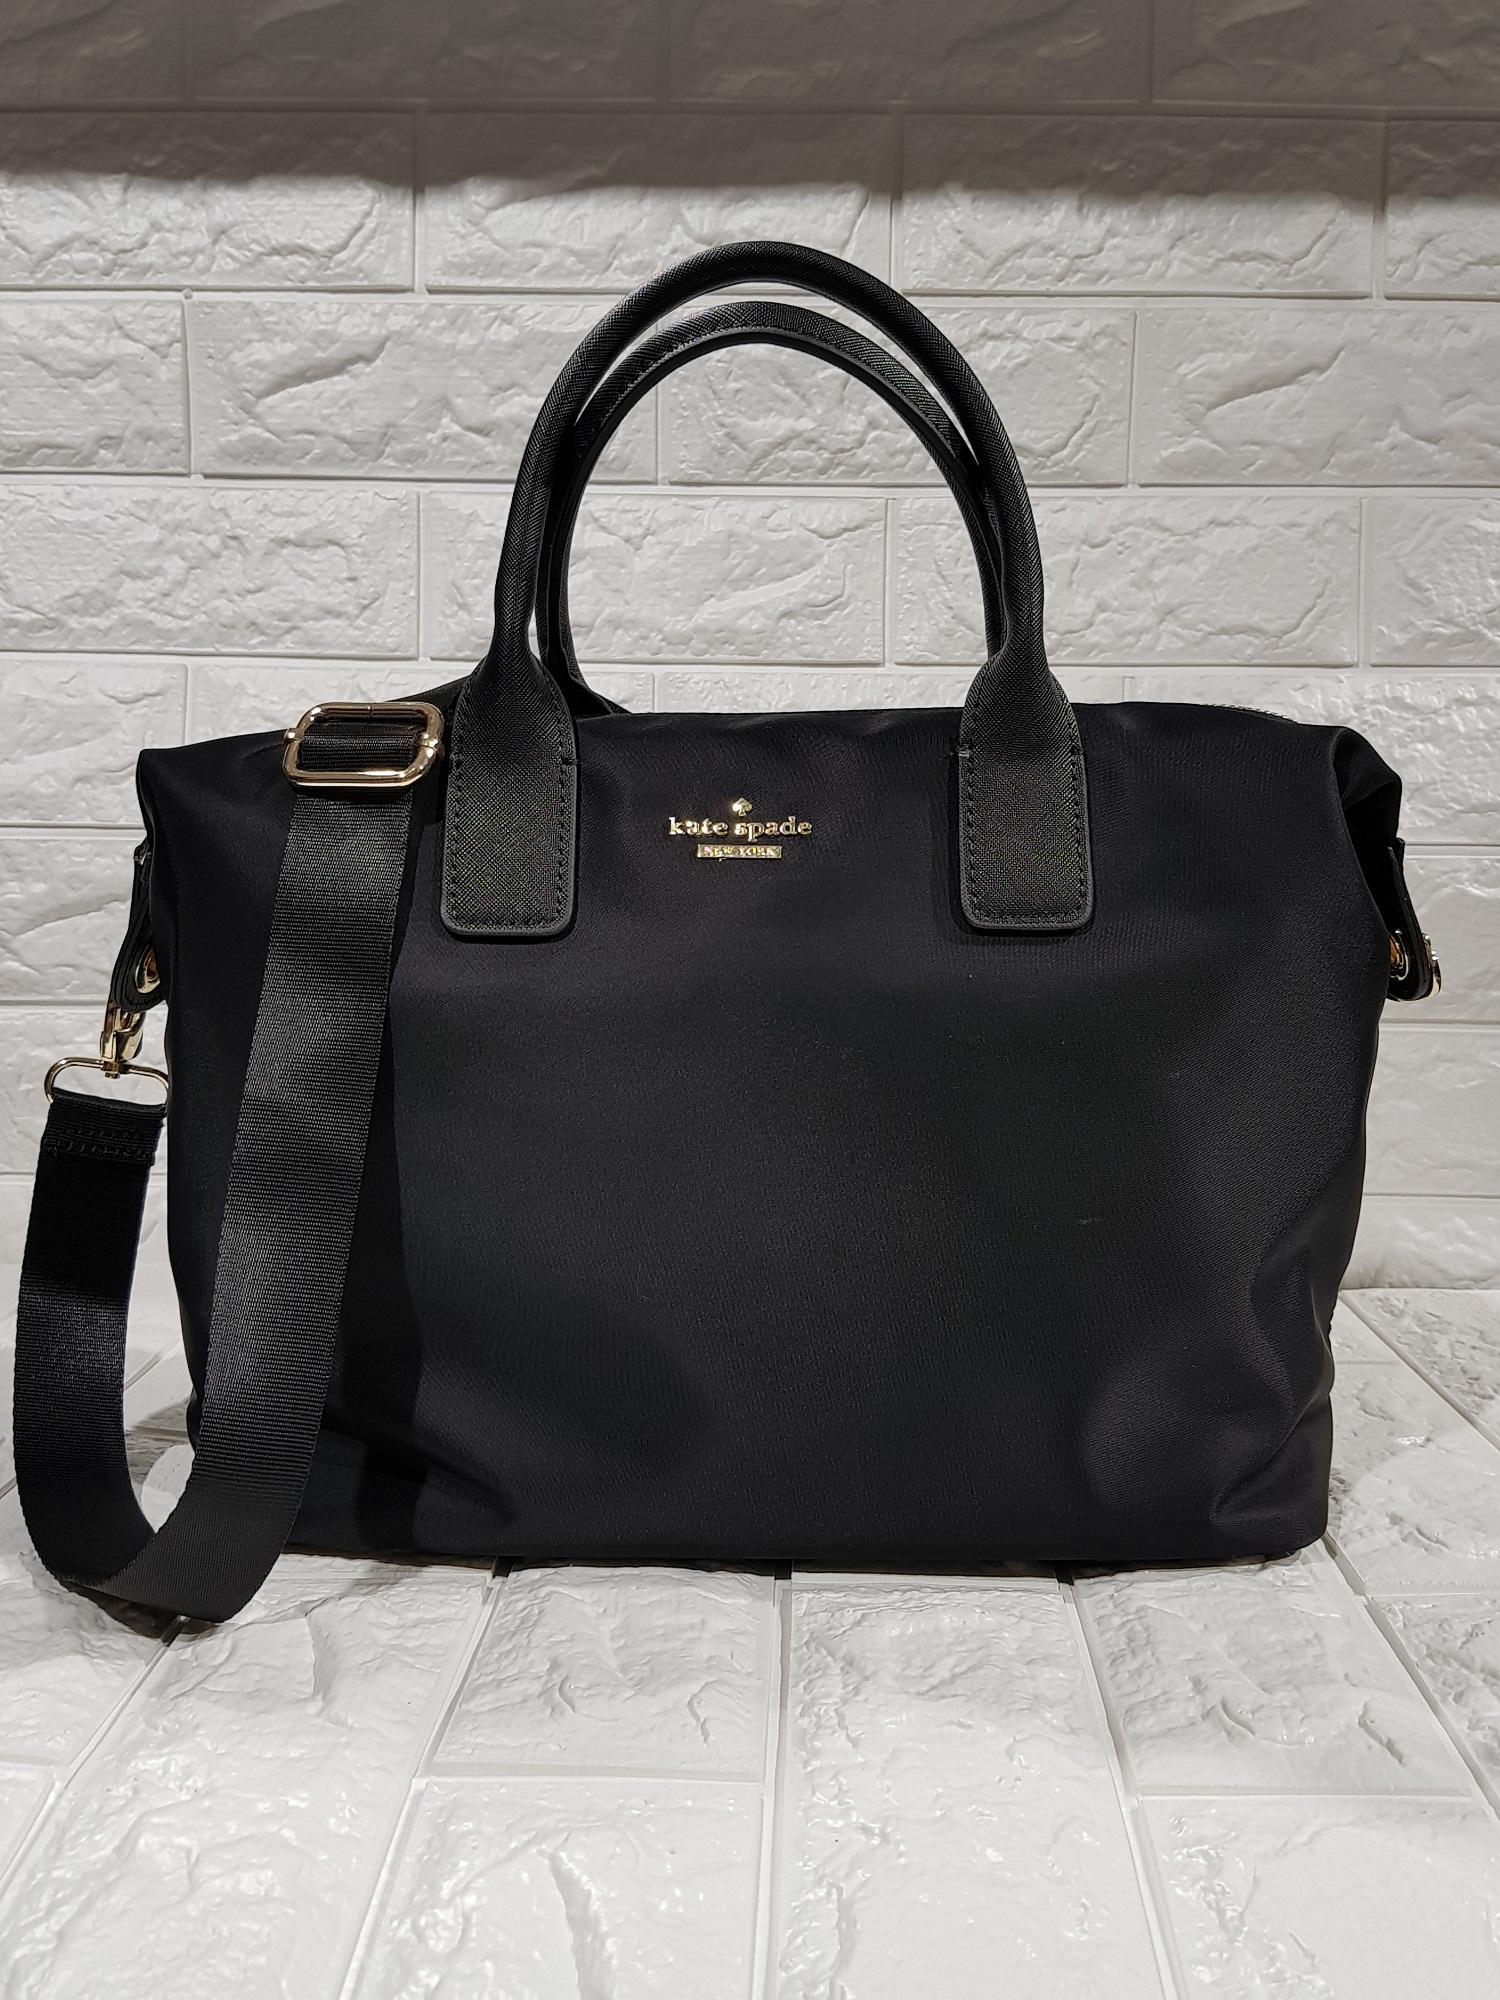 Kate Spade Philippines Kate Spade Price List Kate Spade Tote Bag